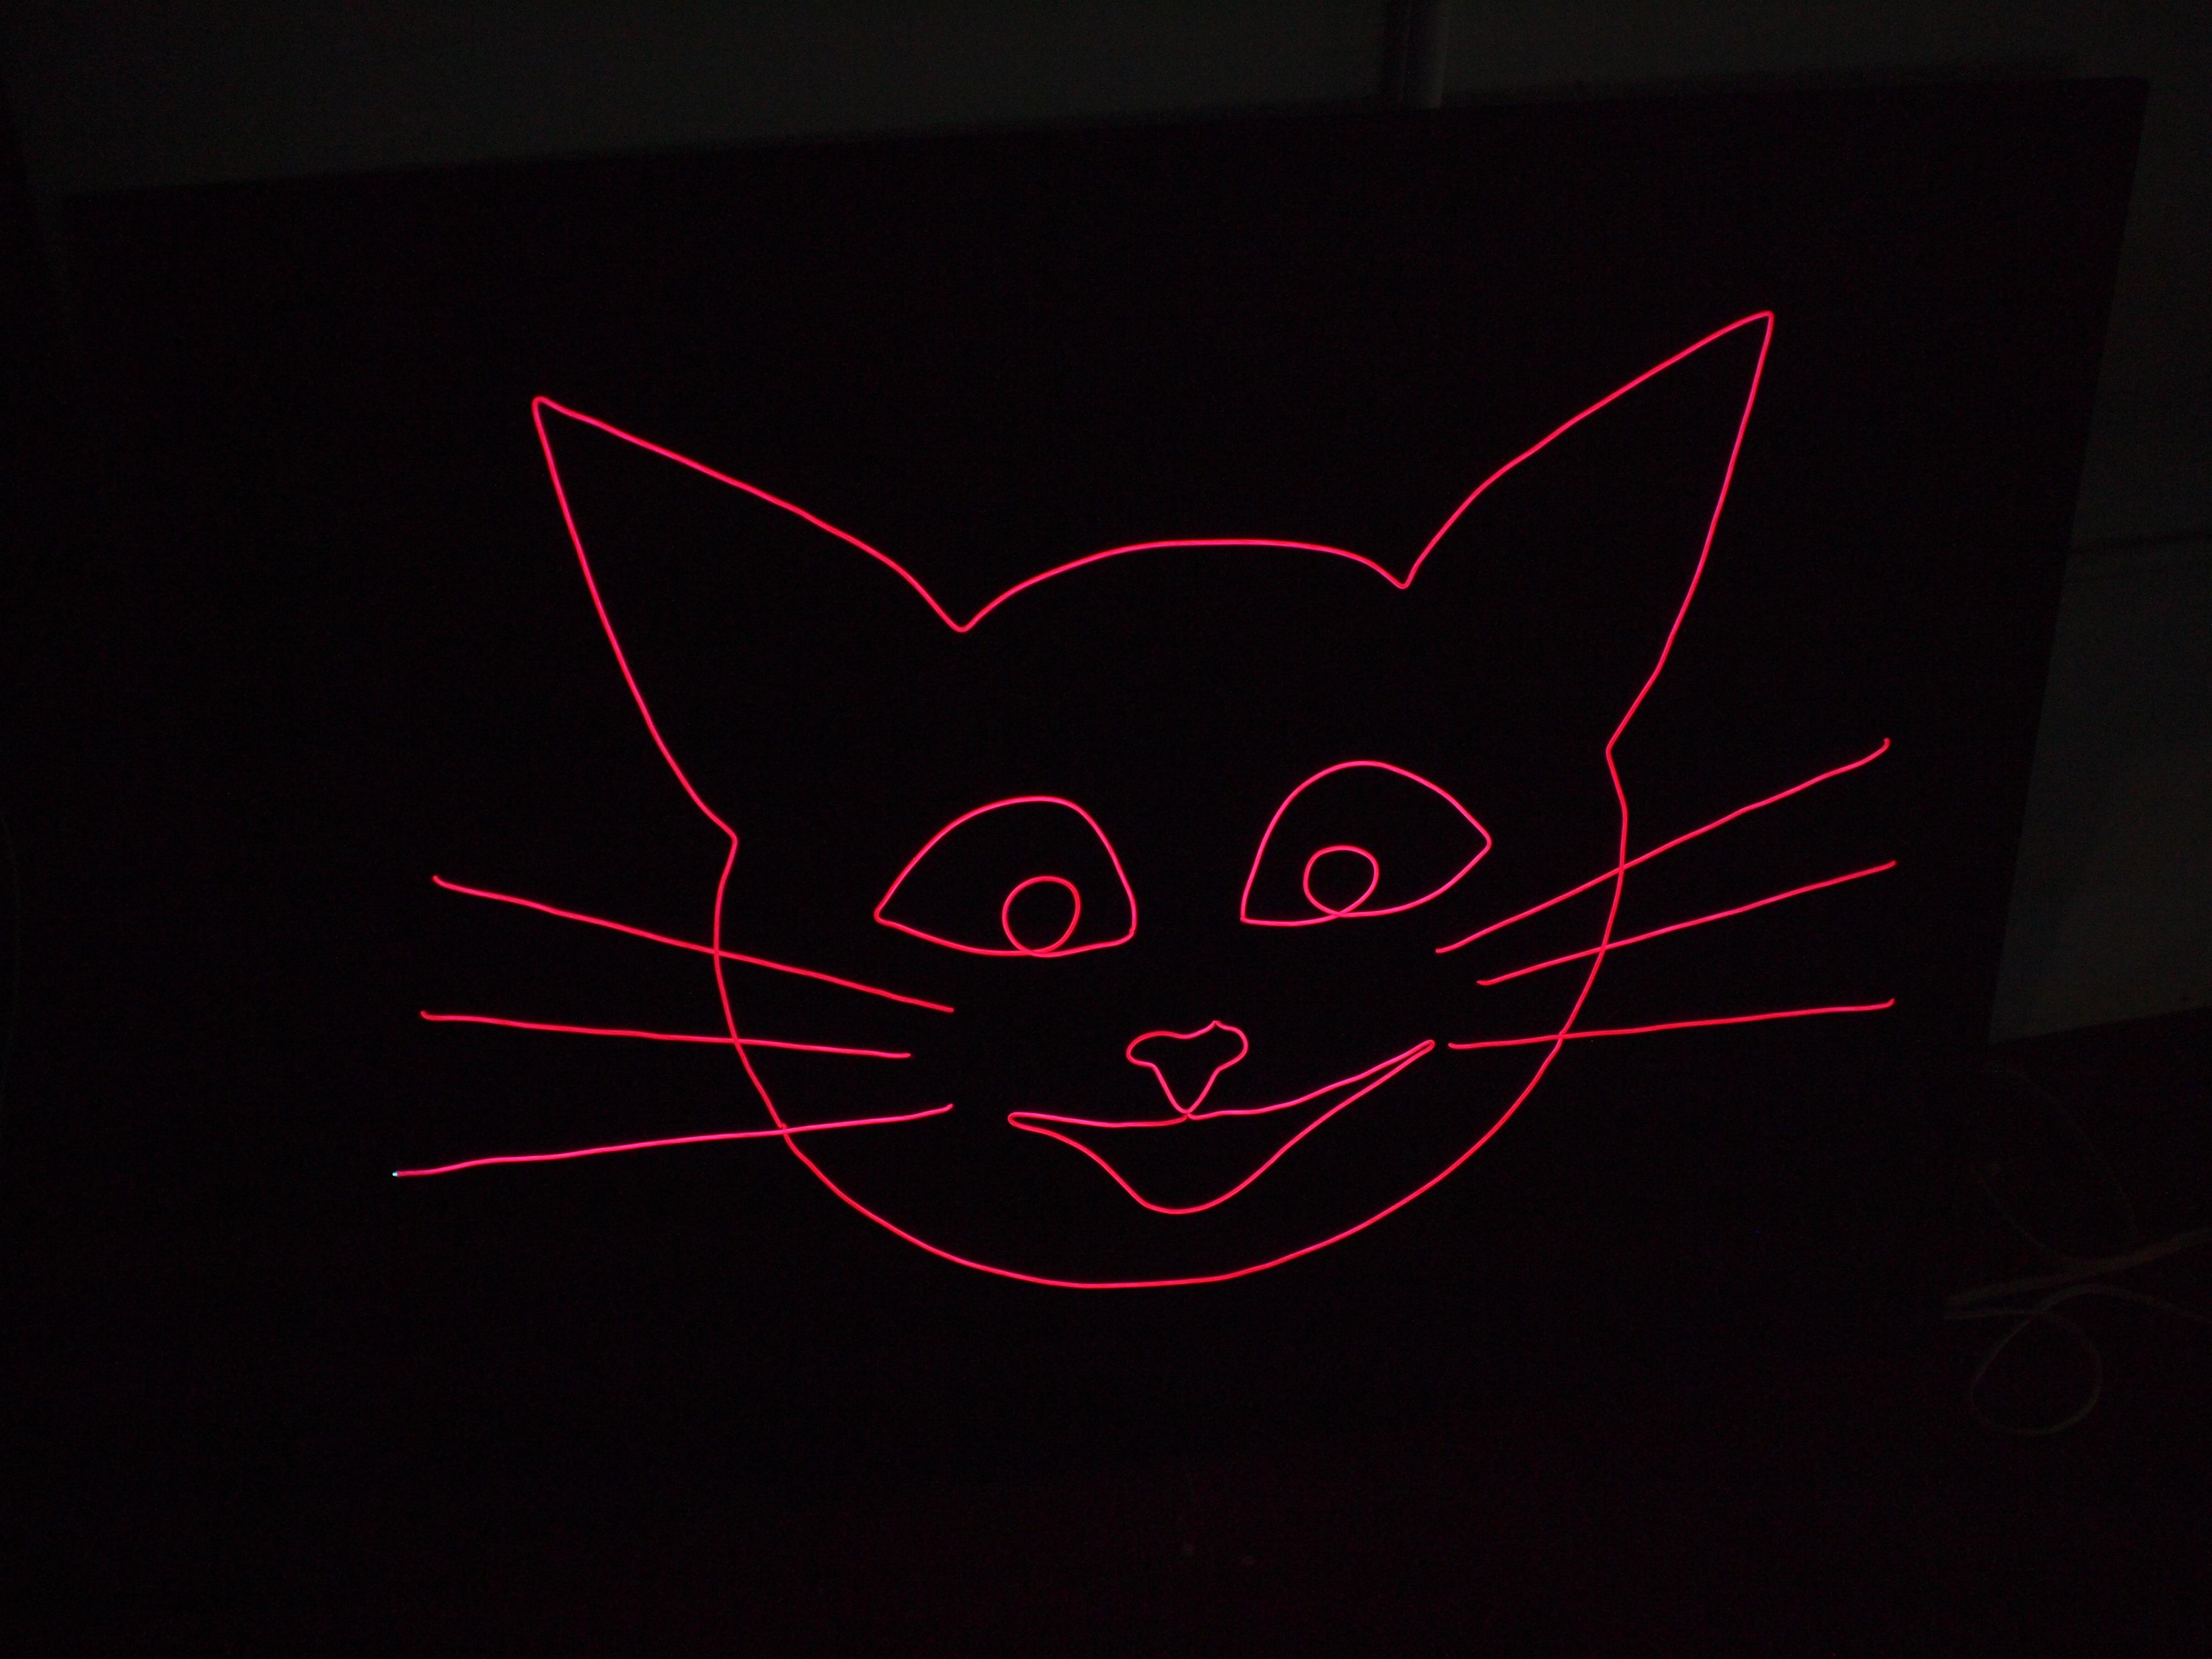 el_wire_tape_panel_cat_glow.jpg